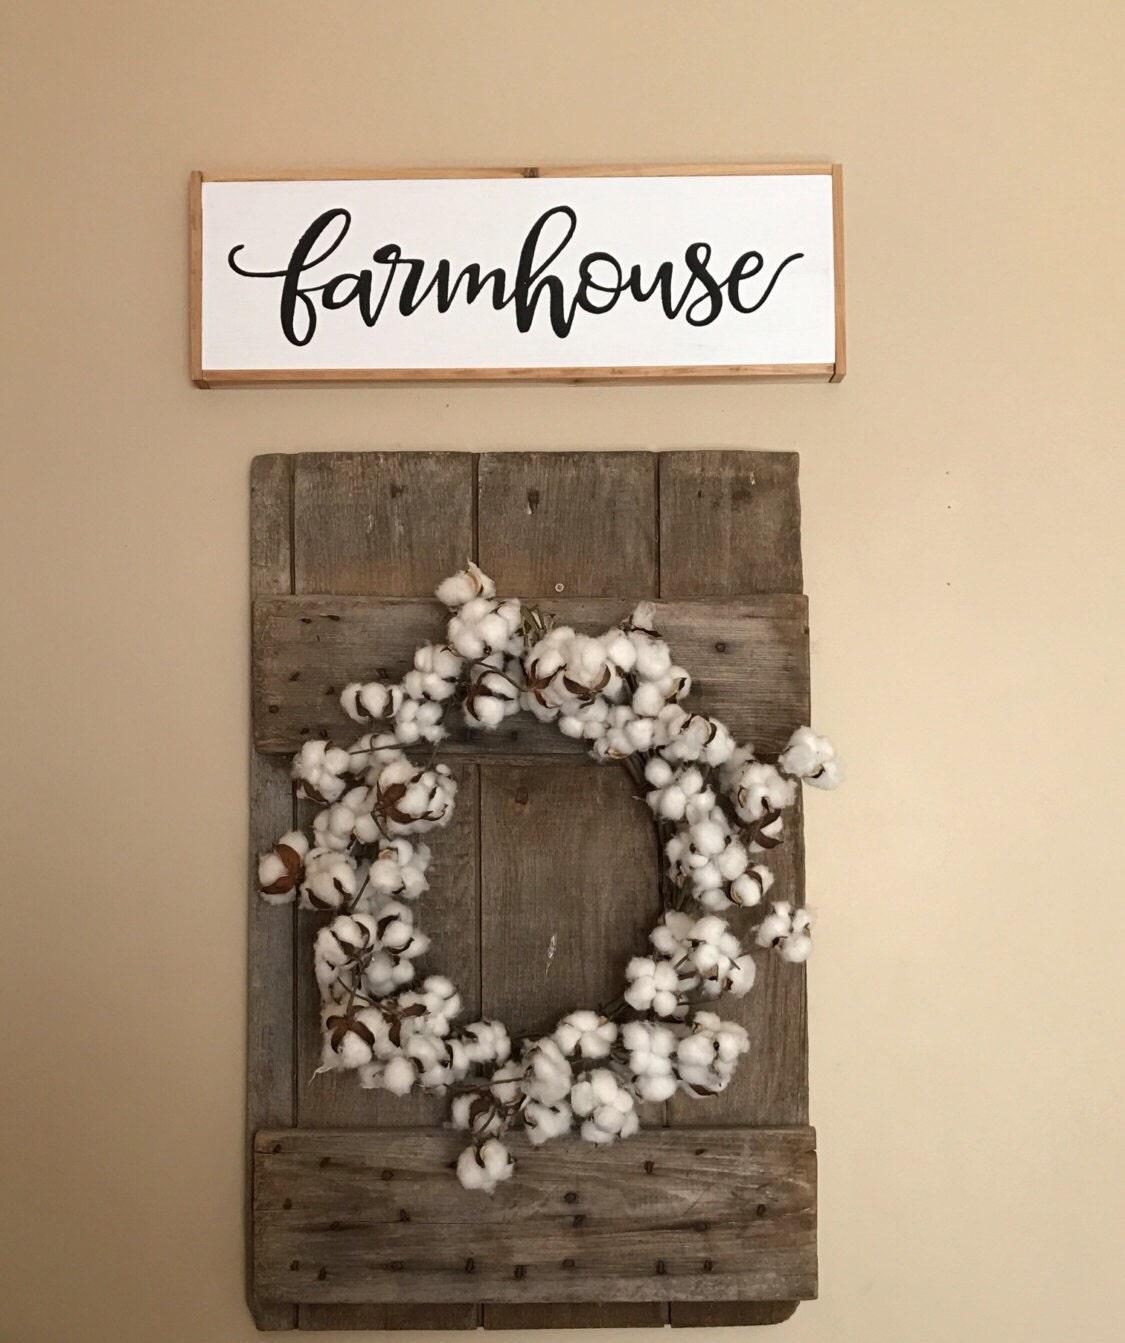 Farmhouse Fixer Upper Style Wood Sign Wall Decor Art by KHRustics